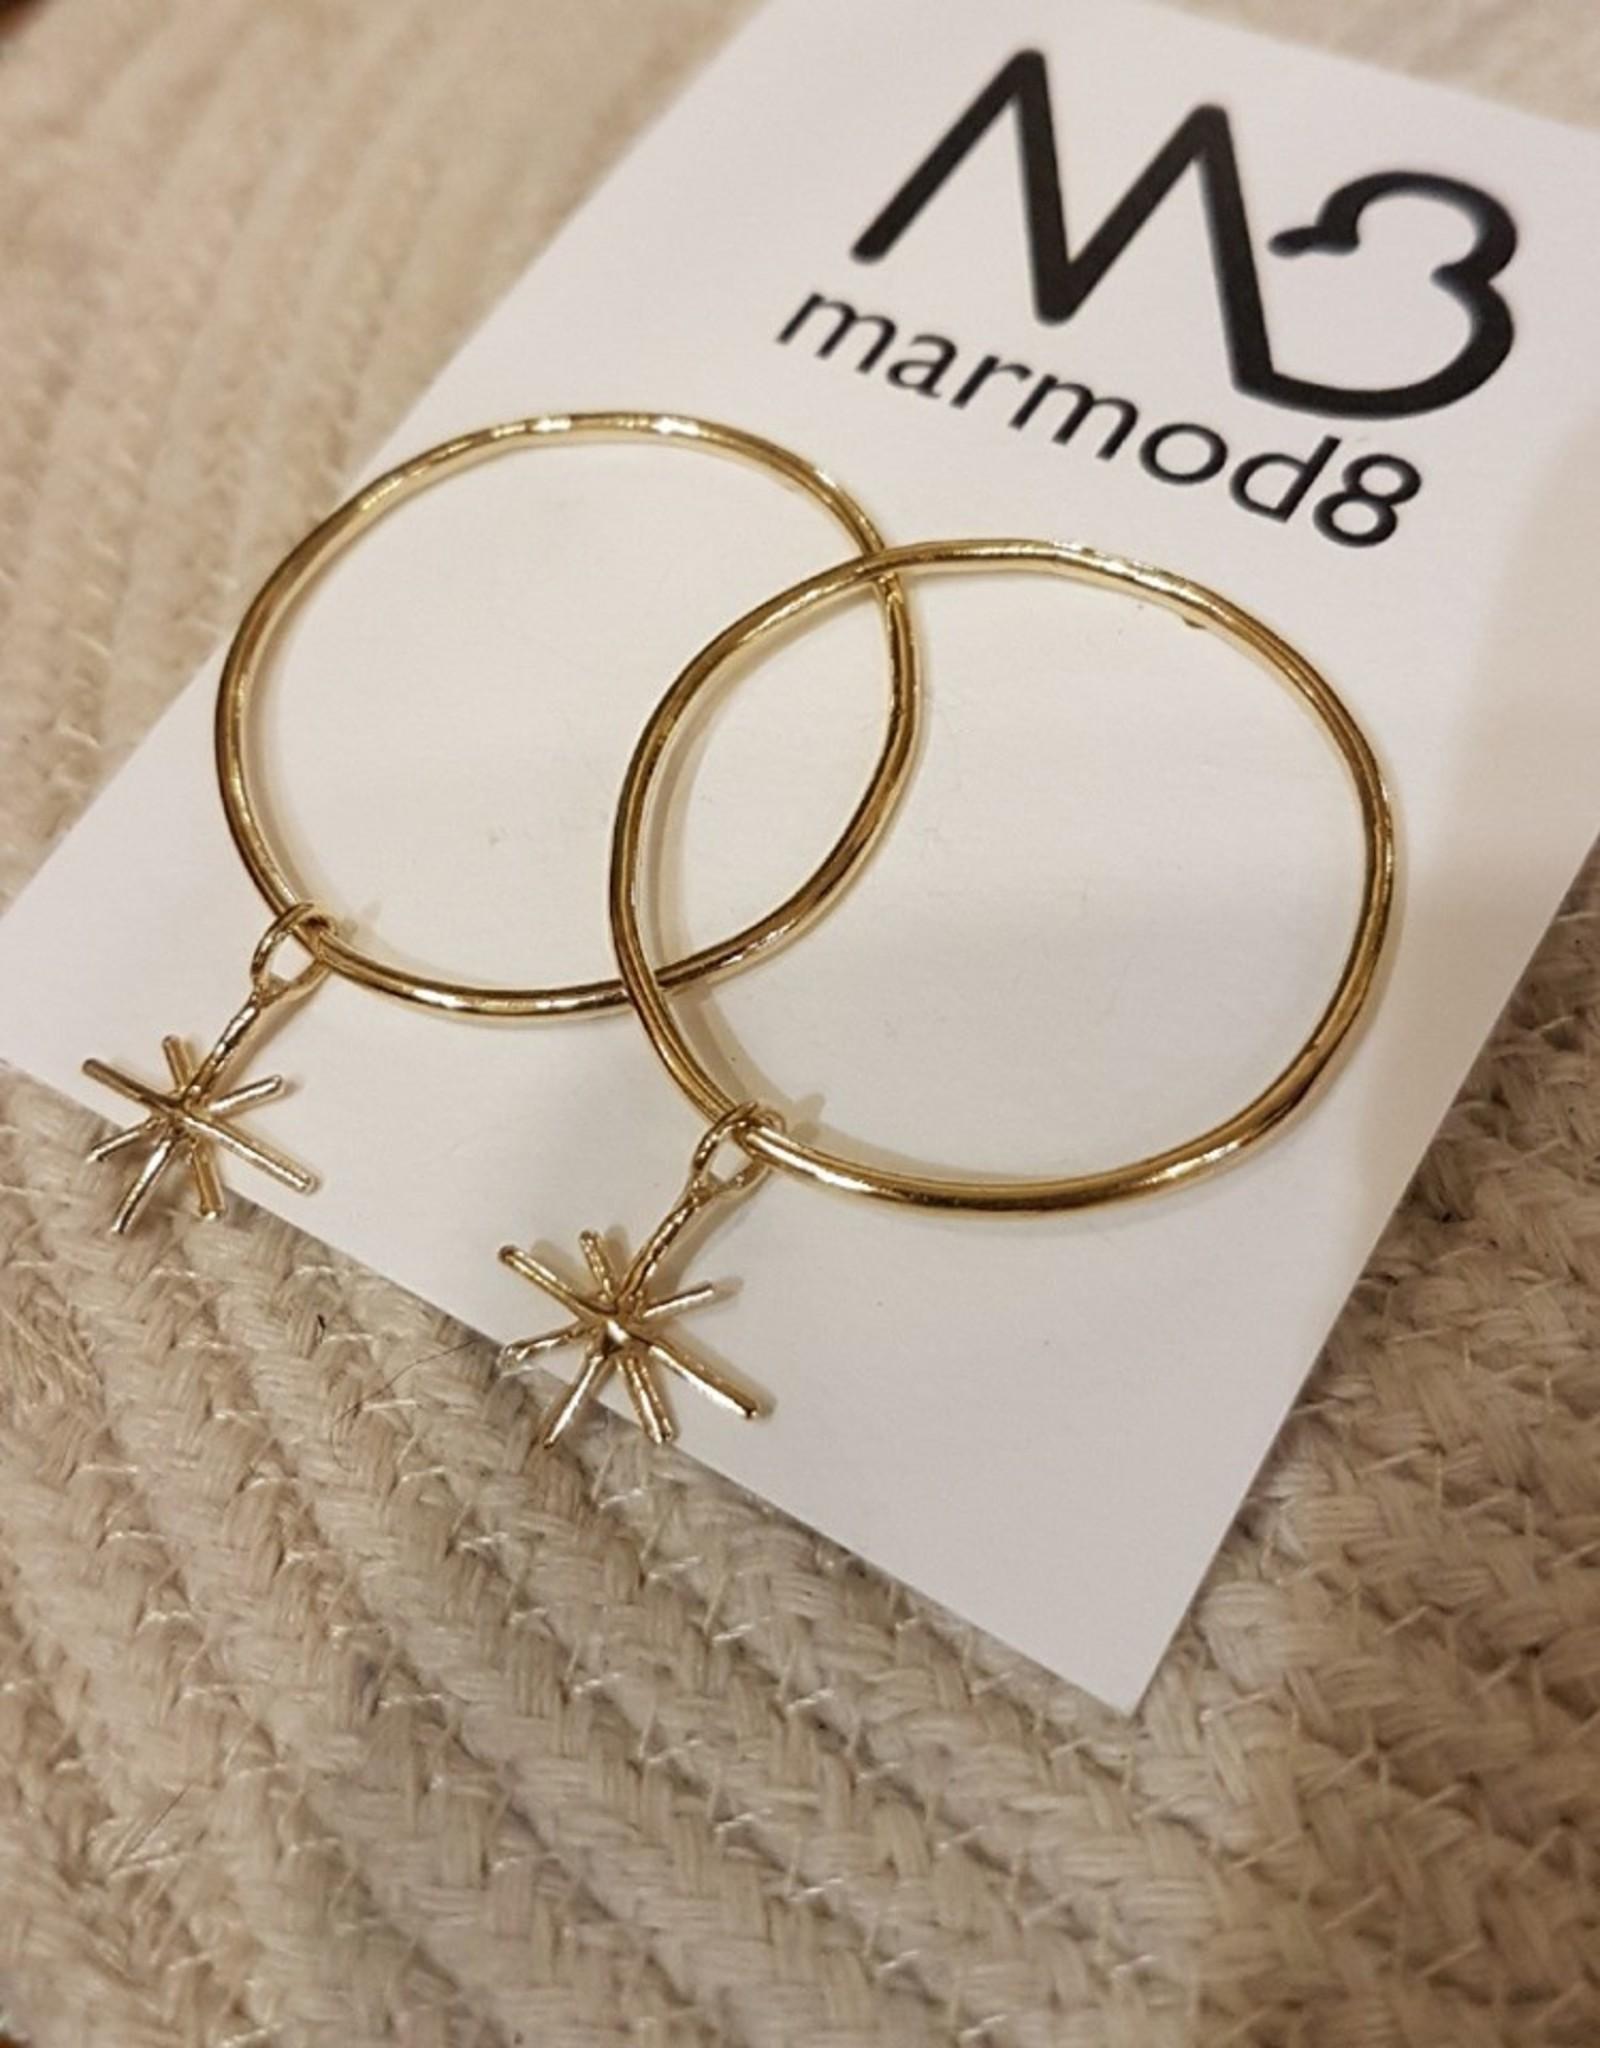 Marmod8 Boucles d'oreilles Vega Gold Plating Marmod8